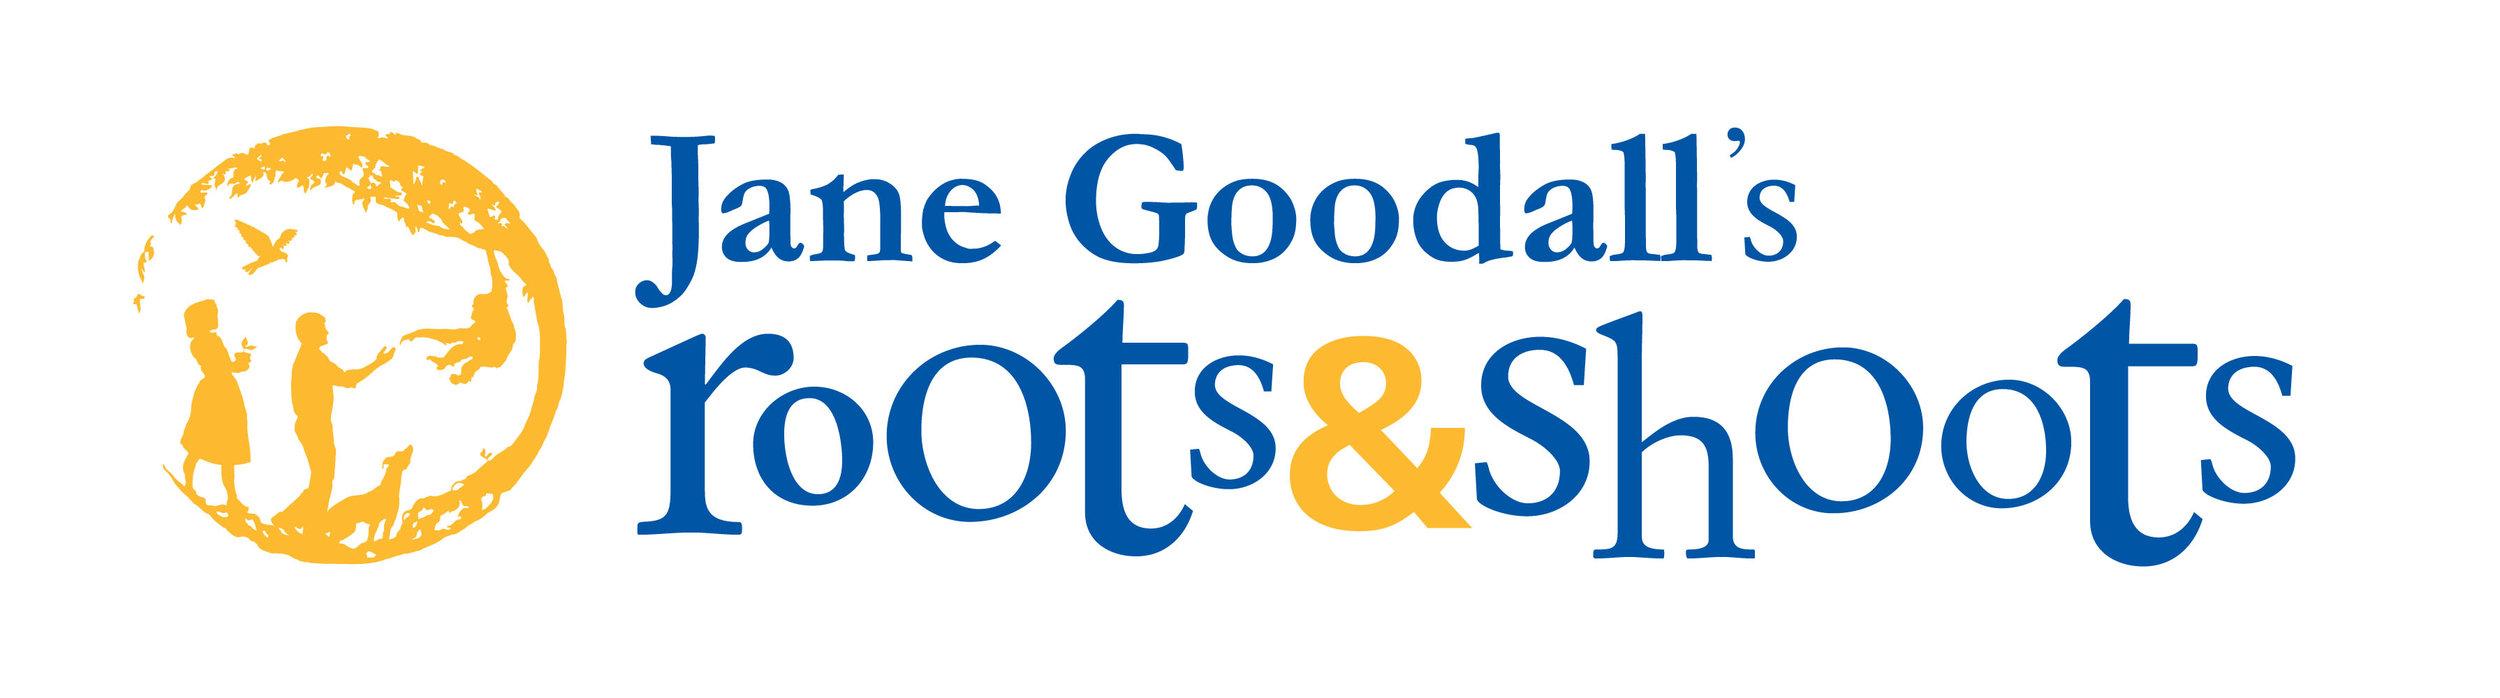 RootsAndShootsLogoColor.jpg